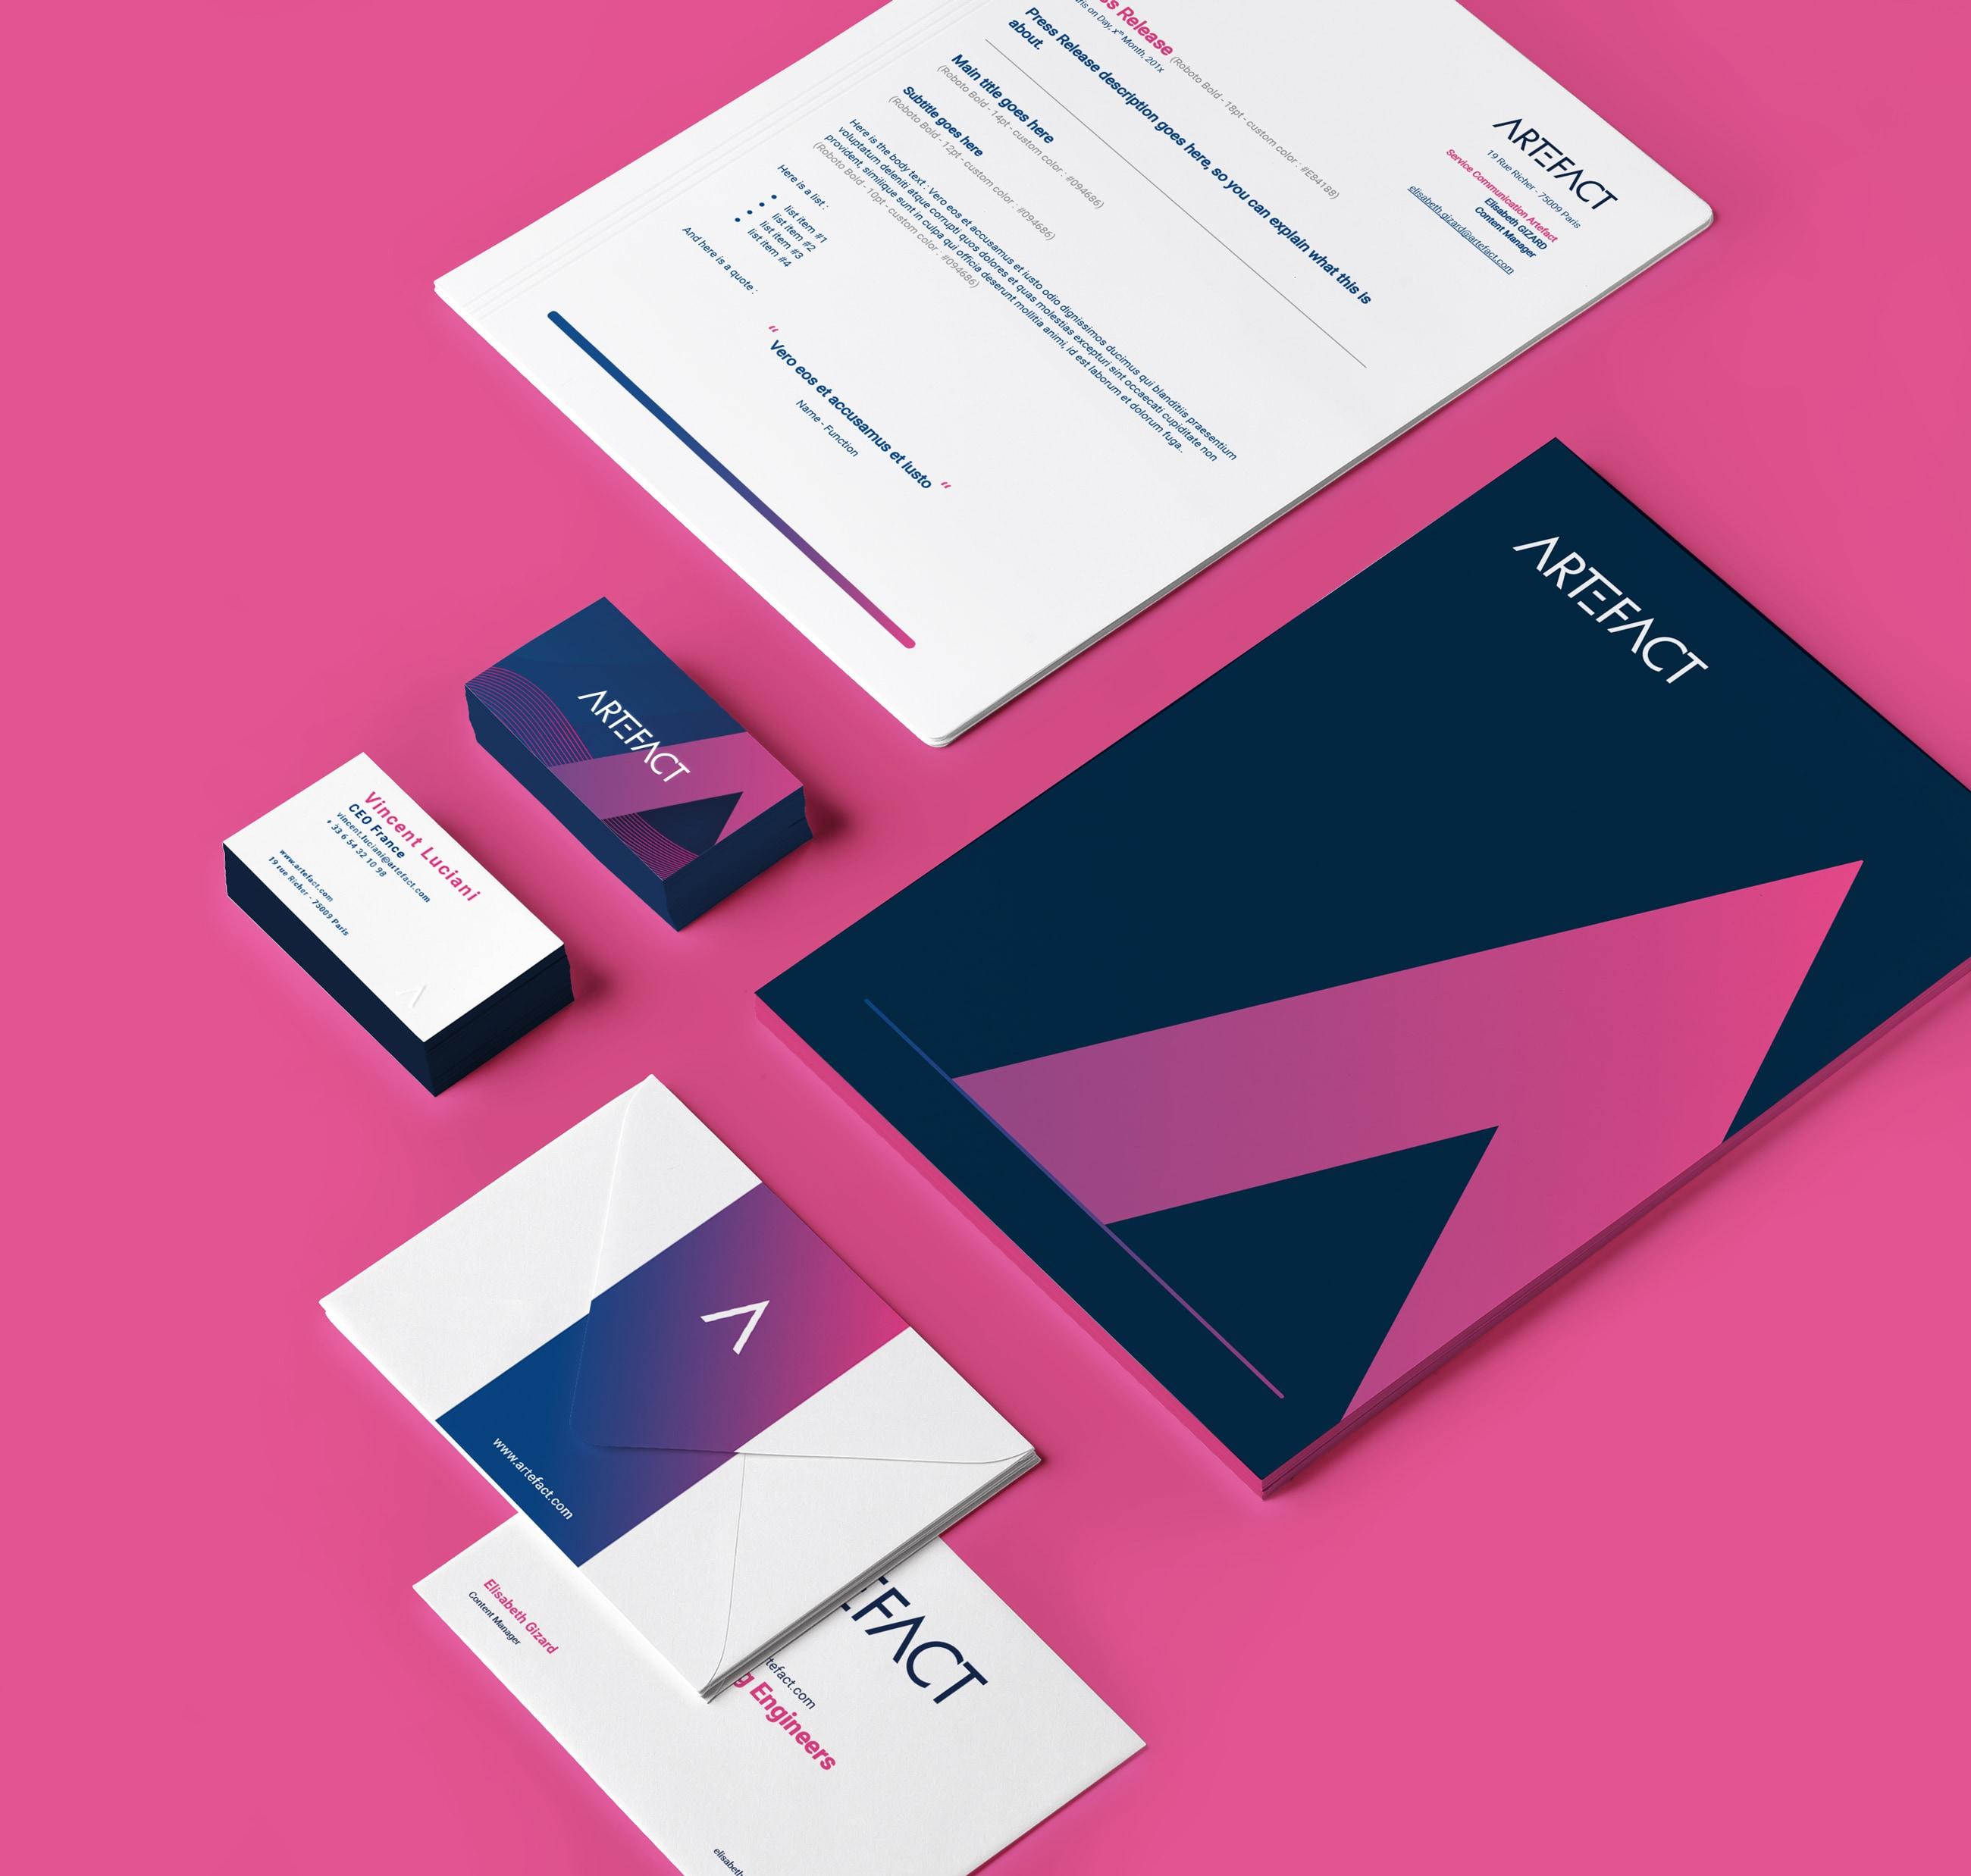 artefact-communication-print-branding